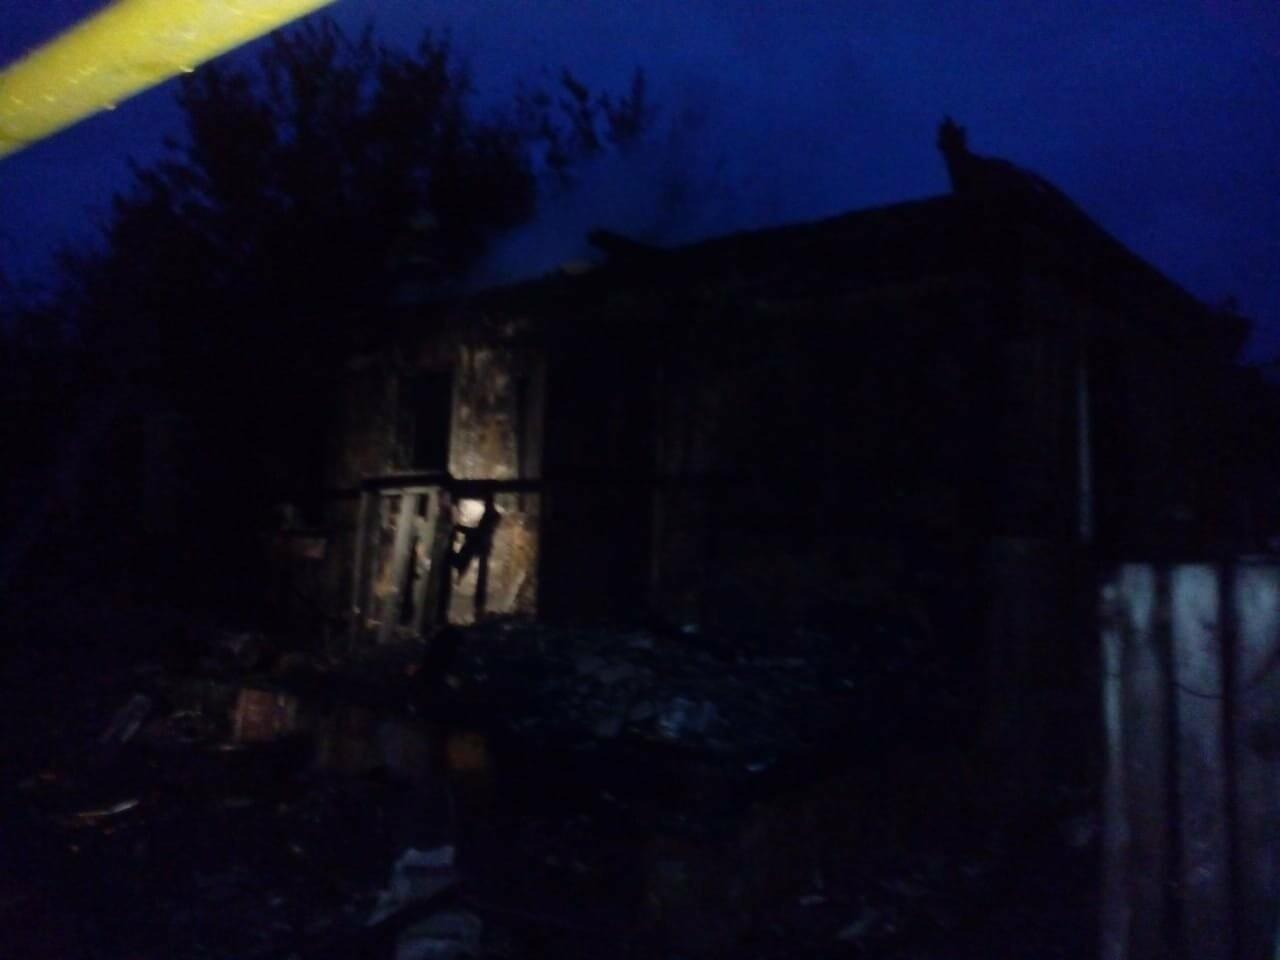 Под Тамбовом при пожаре погибли 4 человека: среди них 4-летний ребенок. ВИДЕО, фото-8